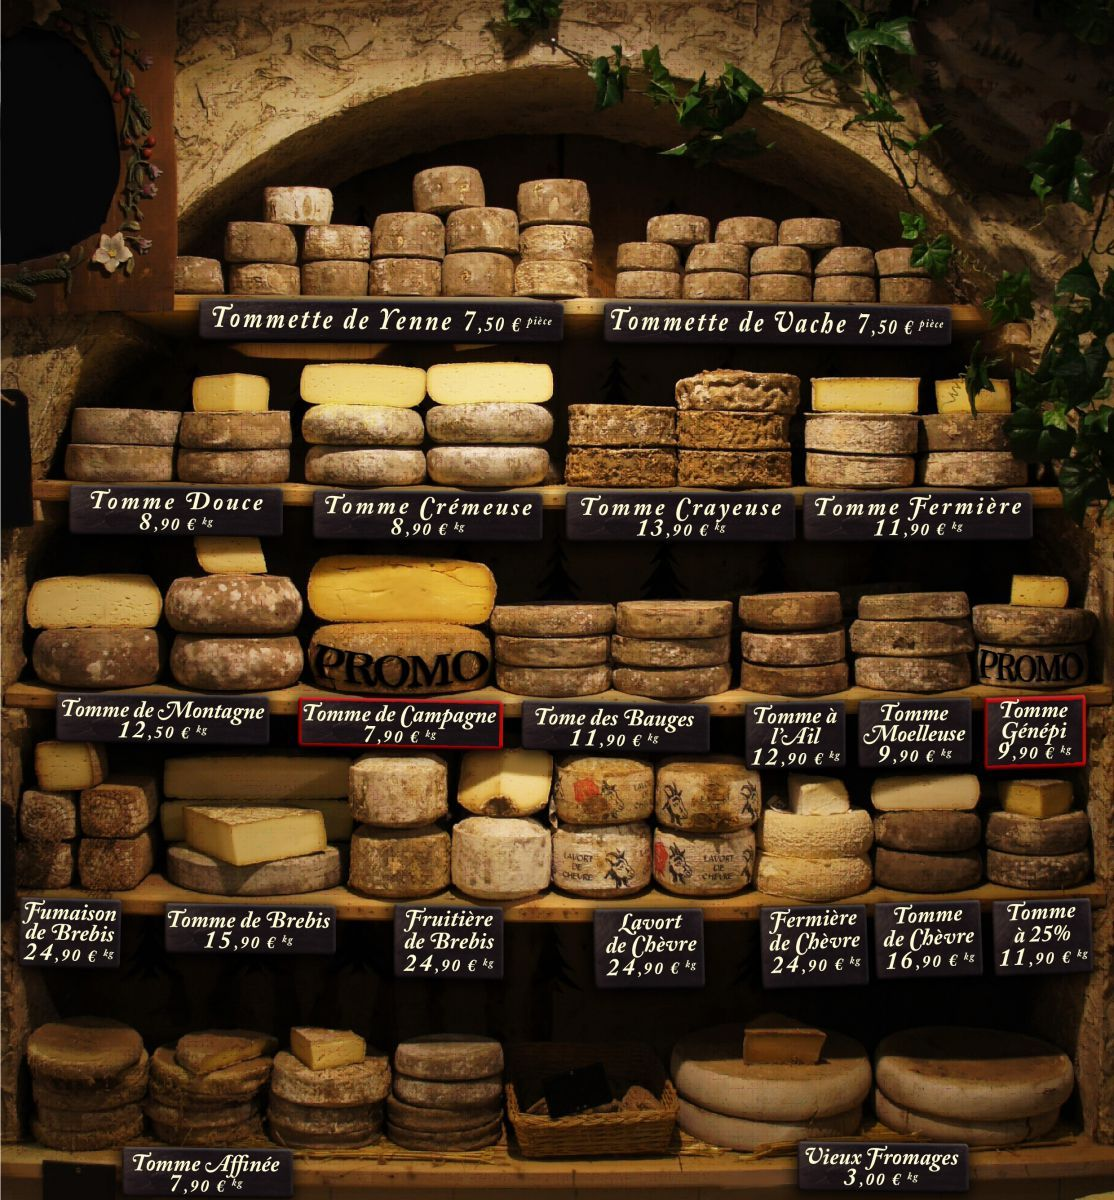 Les Tommes De Savoie La Maison Du Fromage Homemade Cheese Cheese Shop Cheese Cave